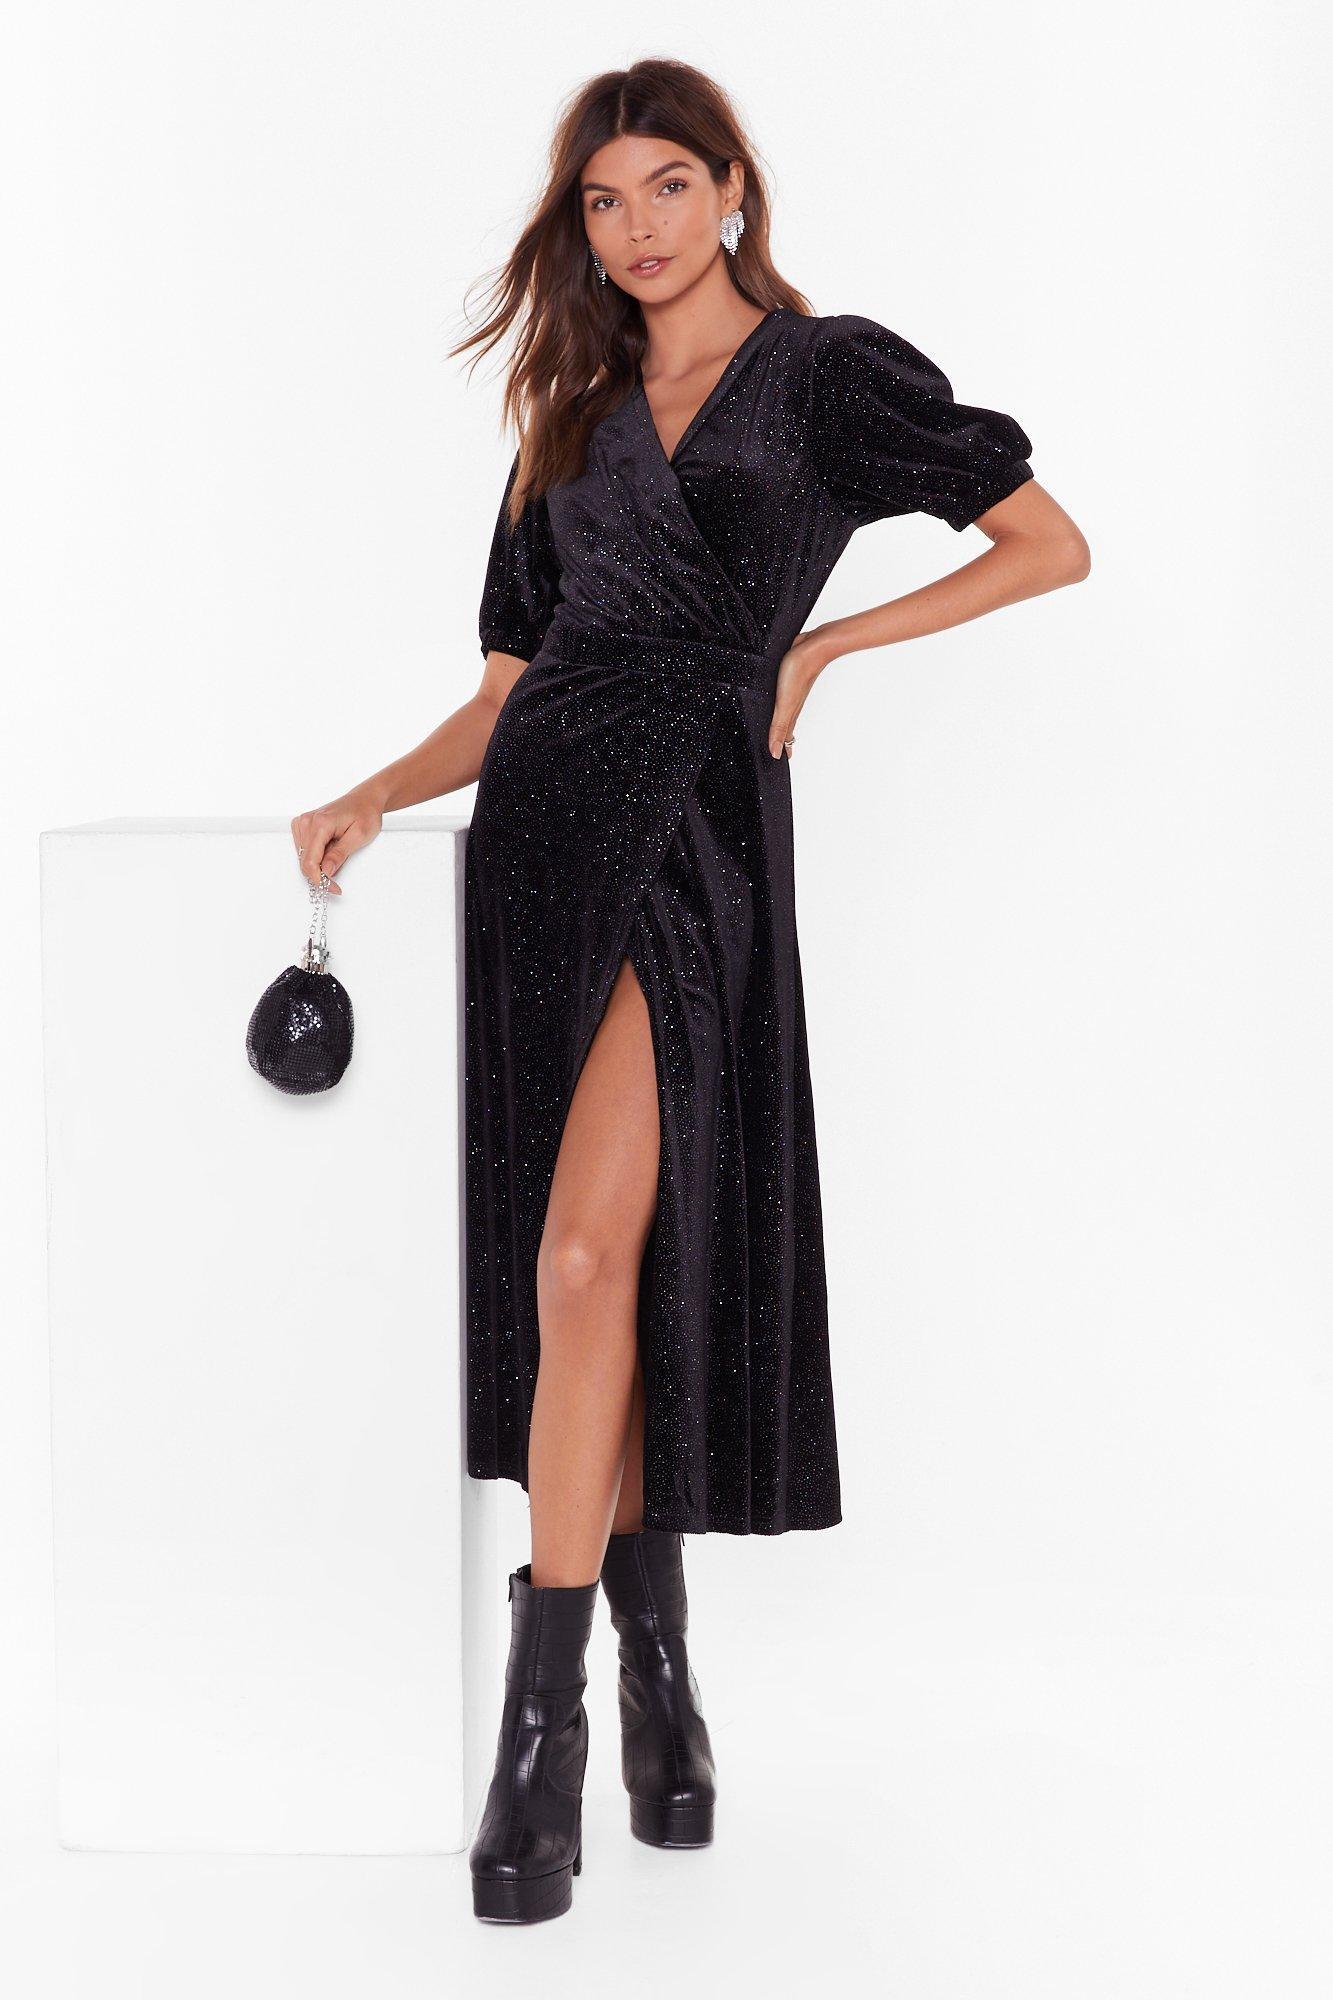 Image of Shine After Shine Velvet Midi Dress